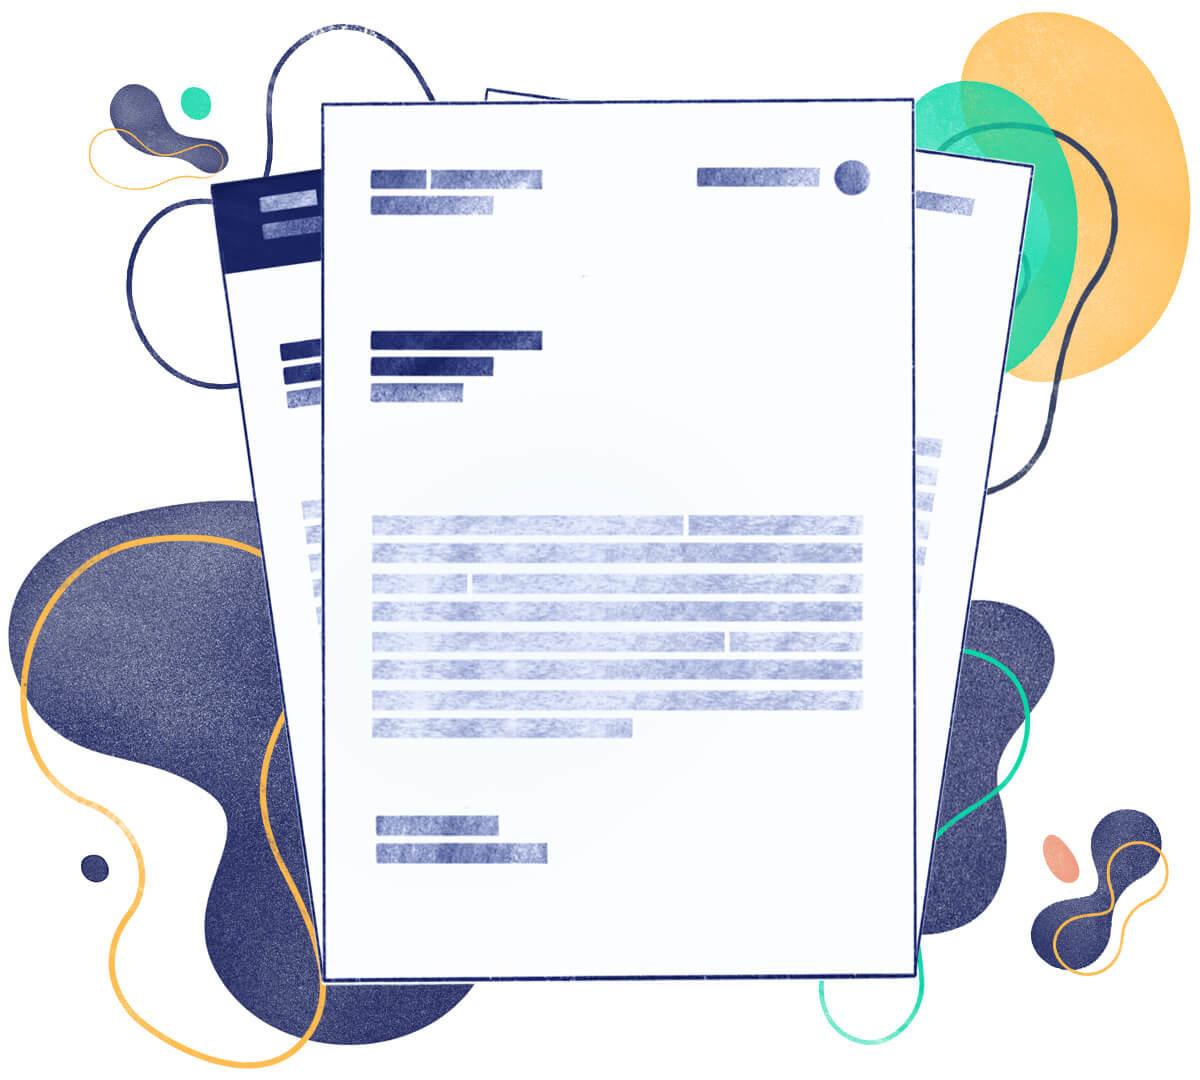 15+ LibreOffice / OpenOffice CV Templates: Free Download